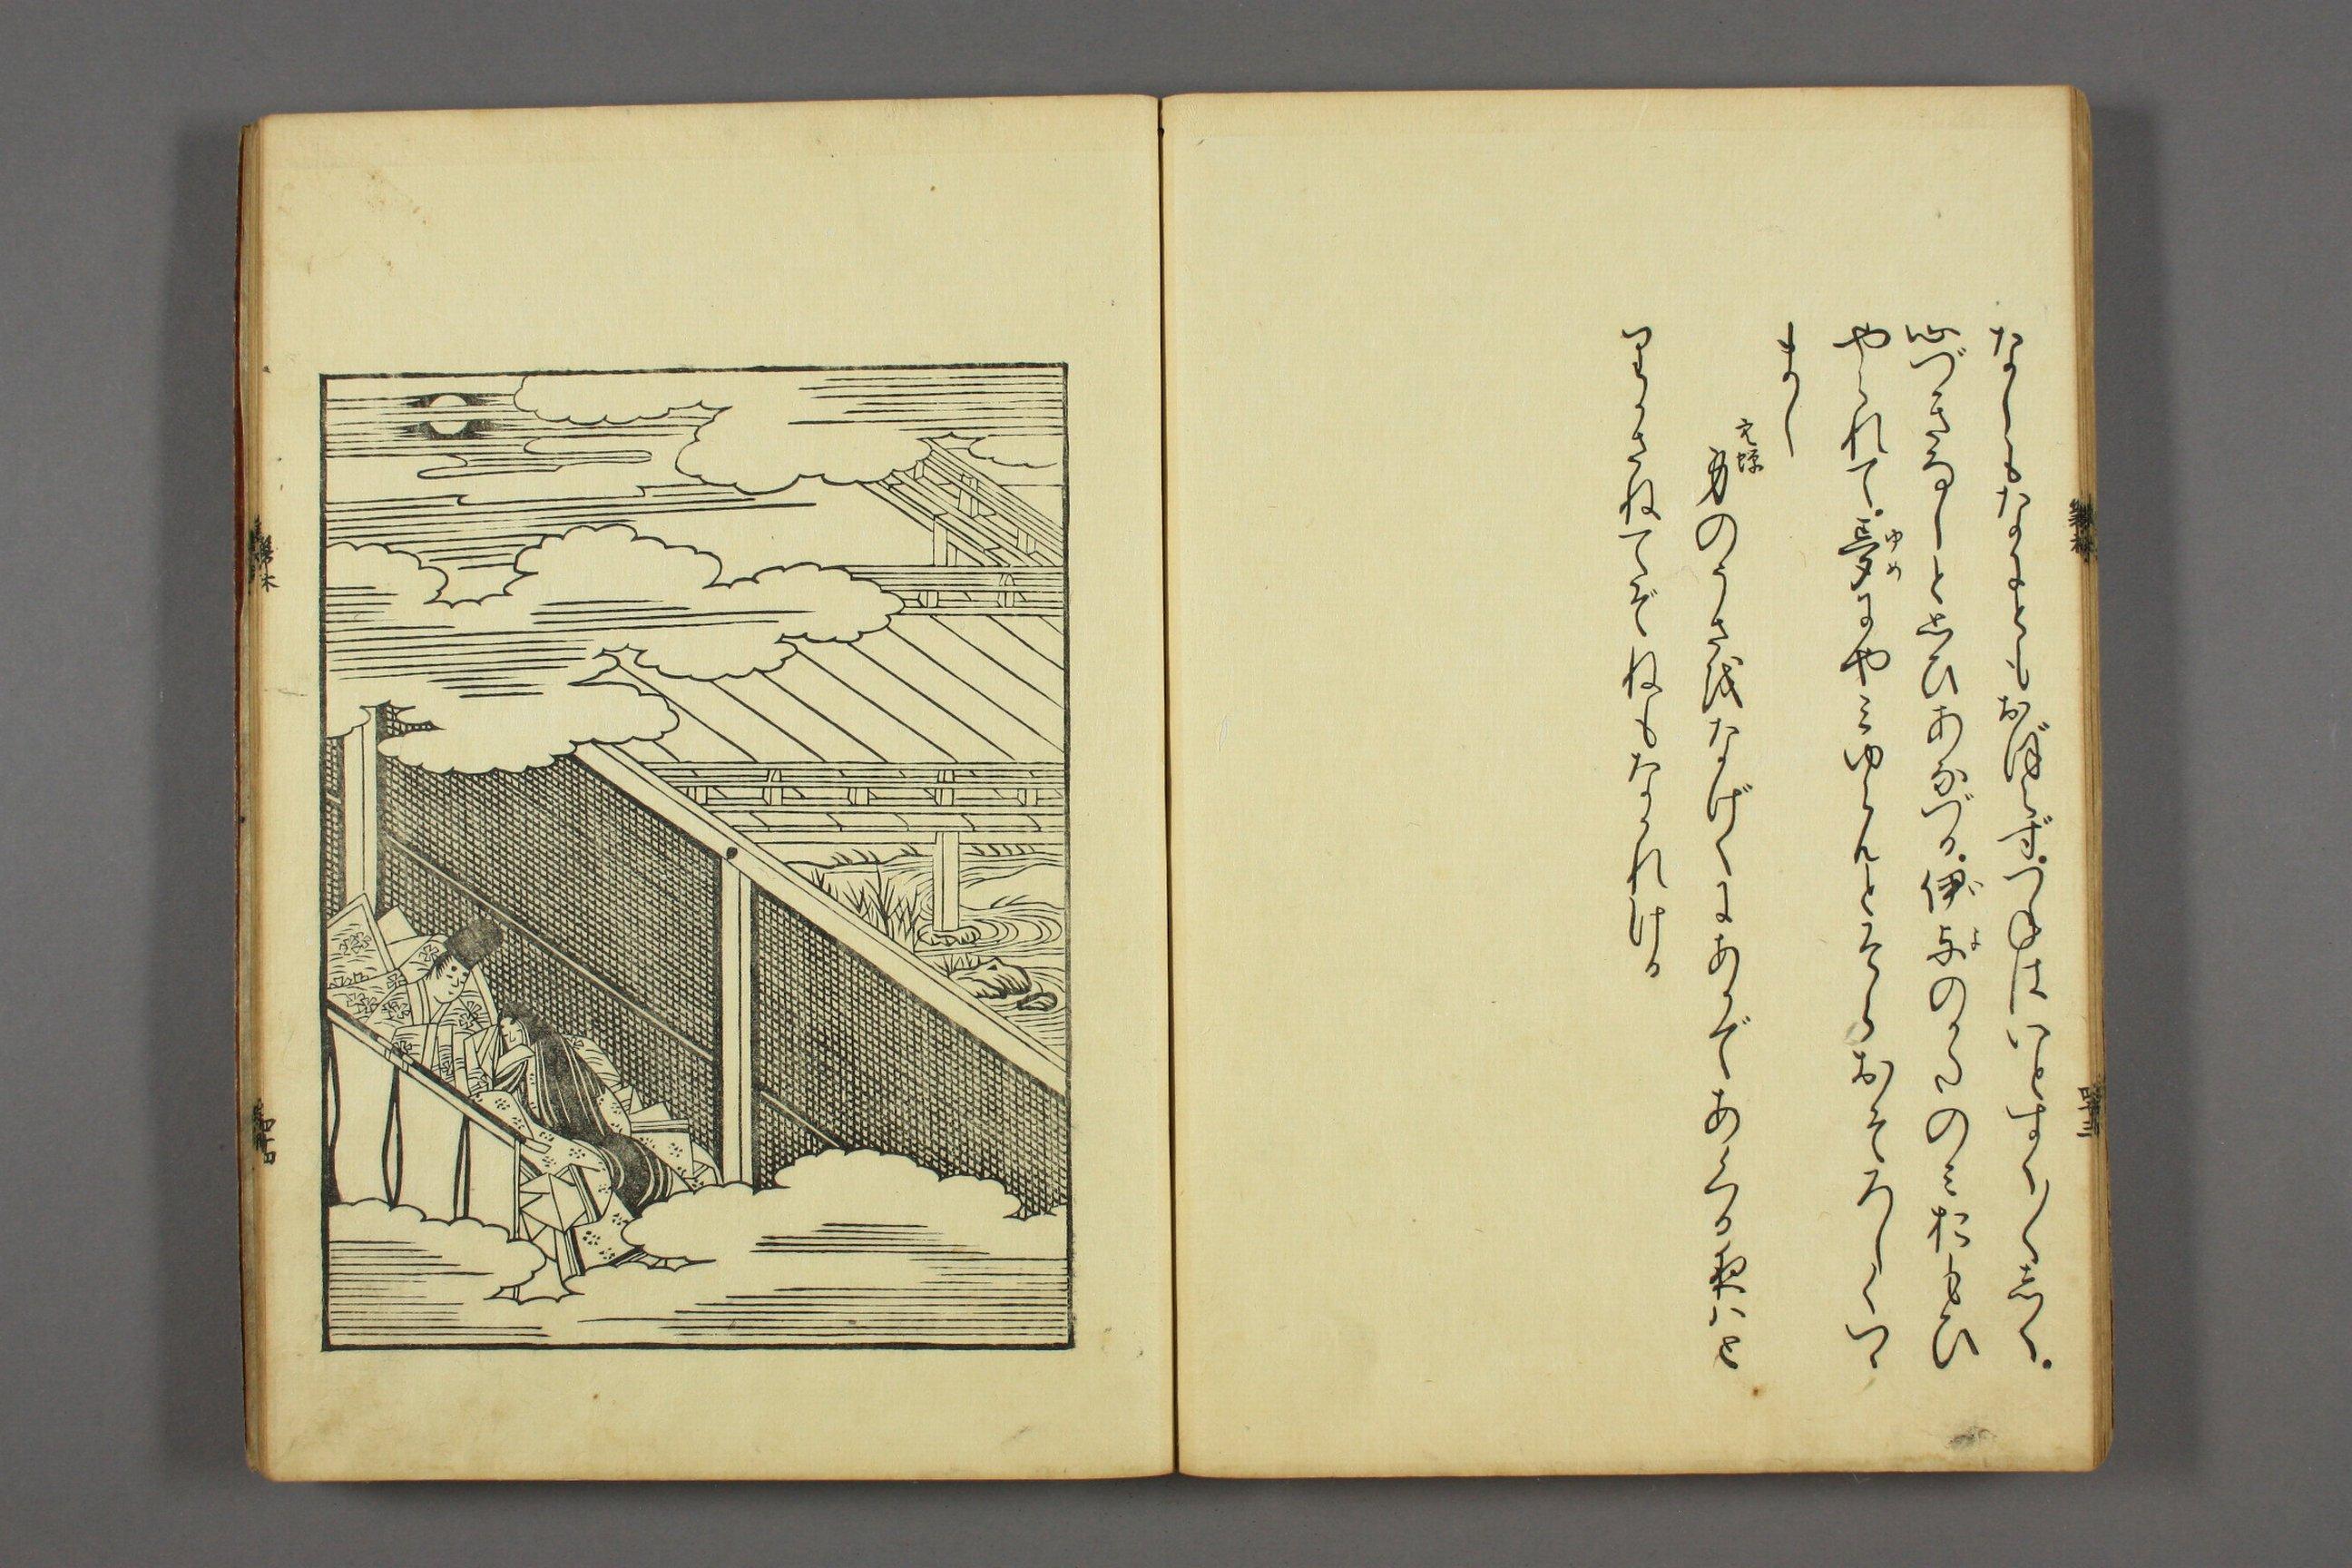 http://archive.wul.waseda.ac.jp/kosho/bunko30/bunko30_a0007/bunko30_a0007_0002/bunko30_a0007_0002_p0045.jpg